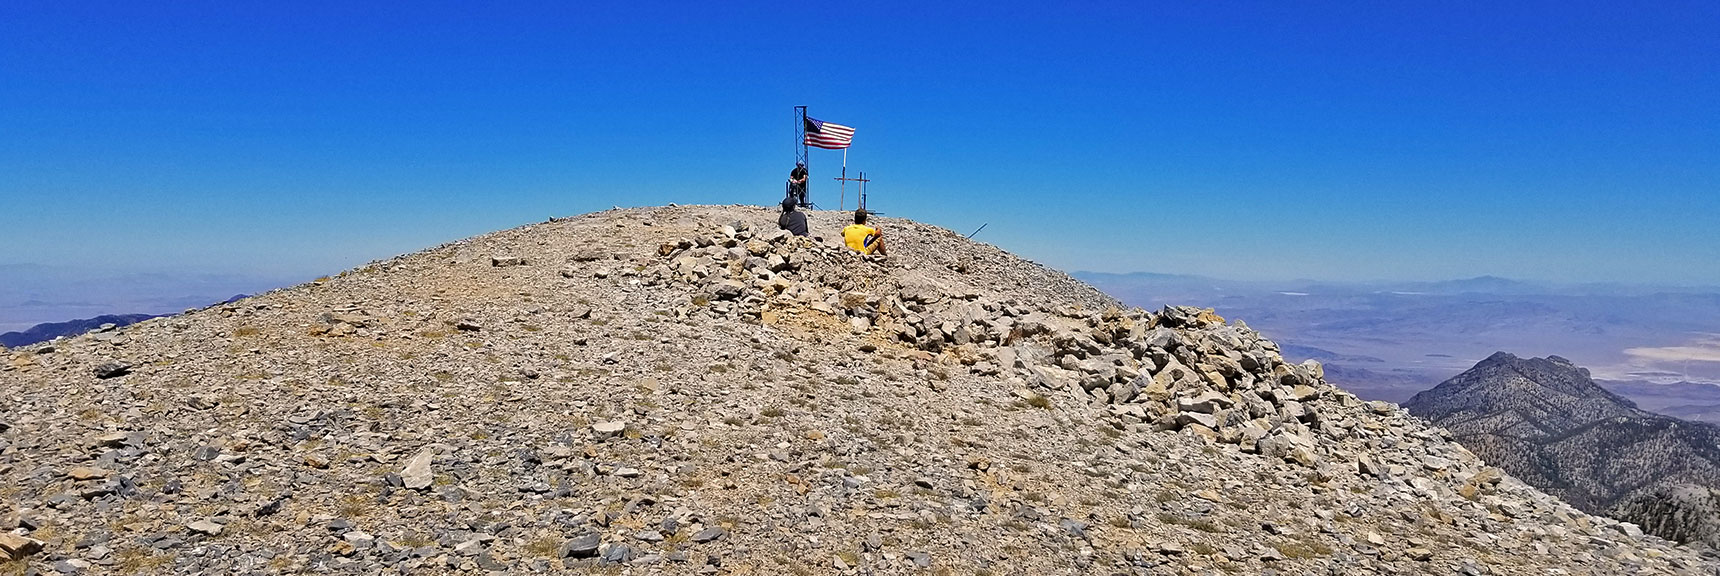 Arrival at Charleston Peak from the South | Griffith Peak & Charleston Peak Circuit Run, Spring Mountains, Nevada